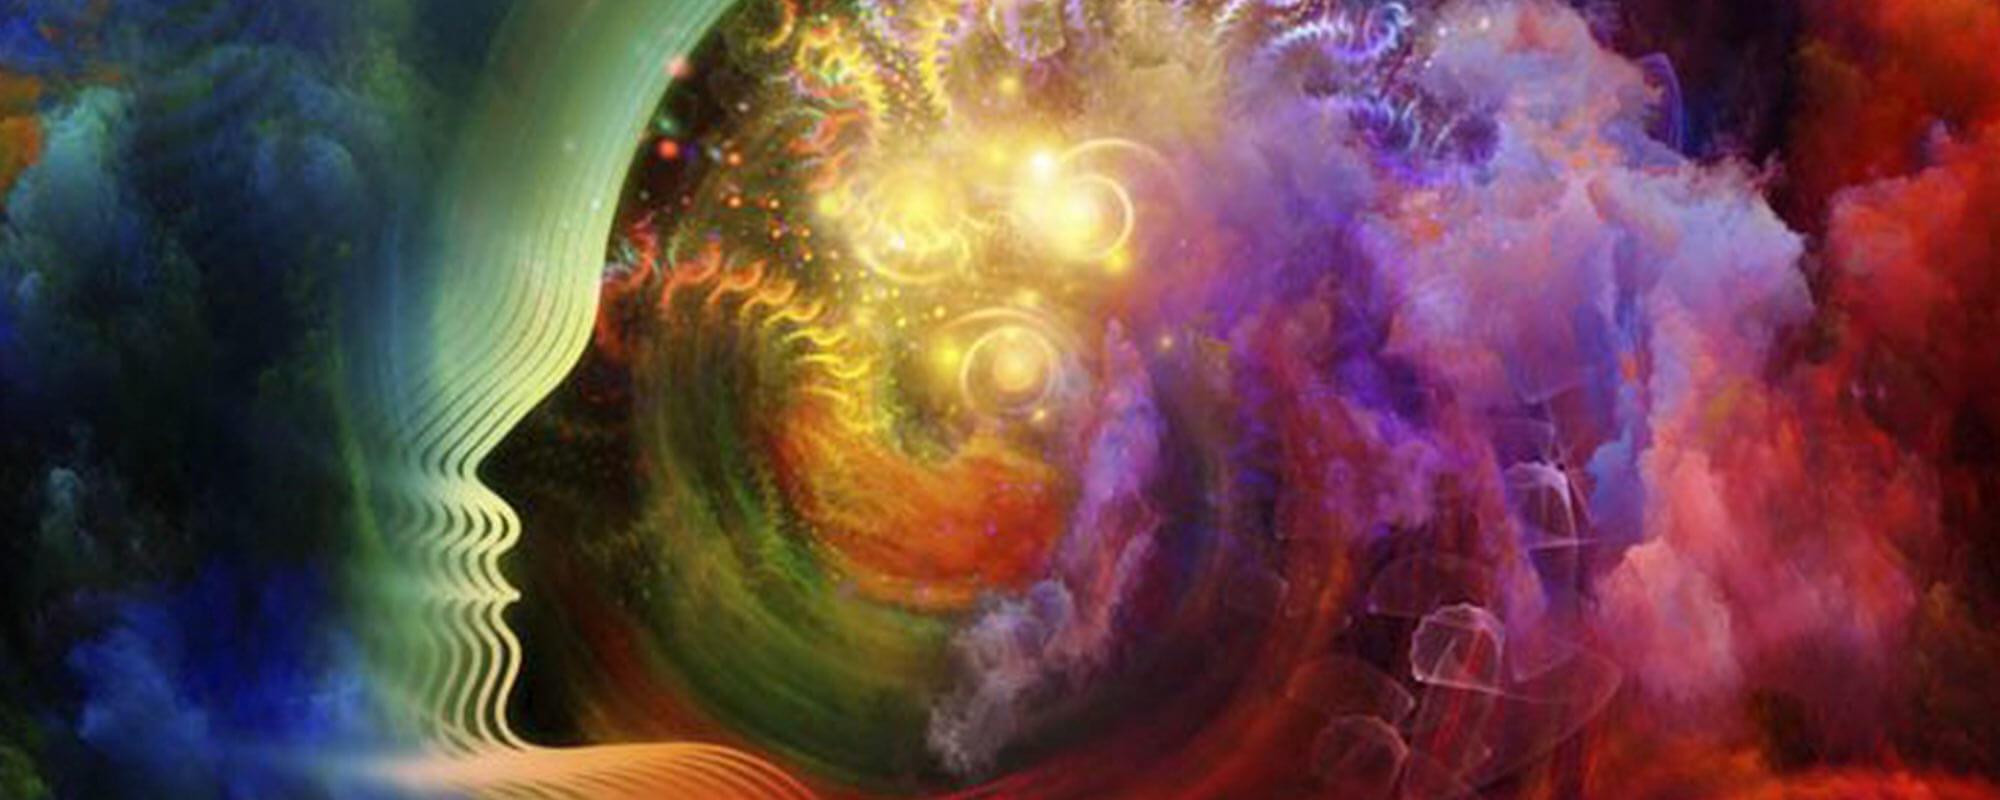 Perceptual Shifting & Intuitive Centering